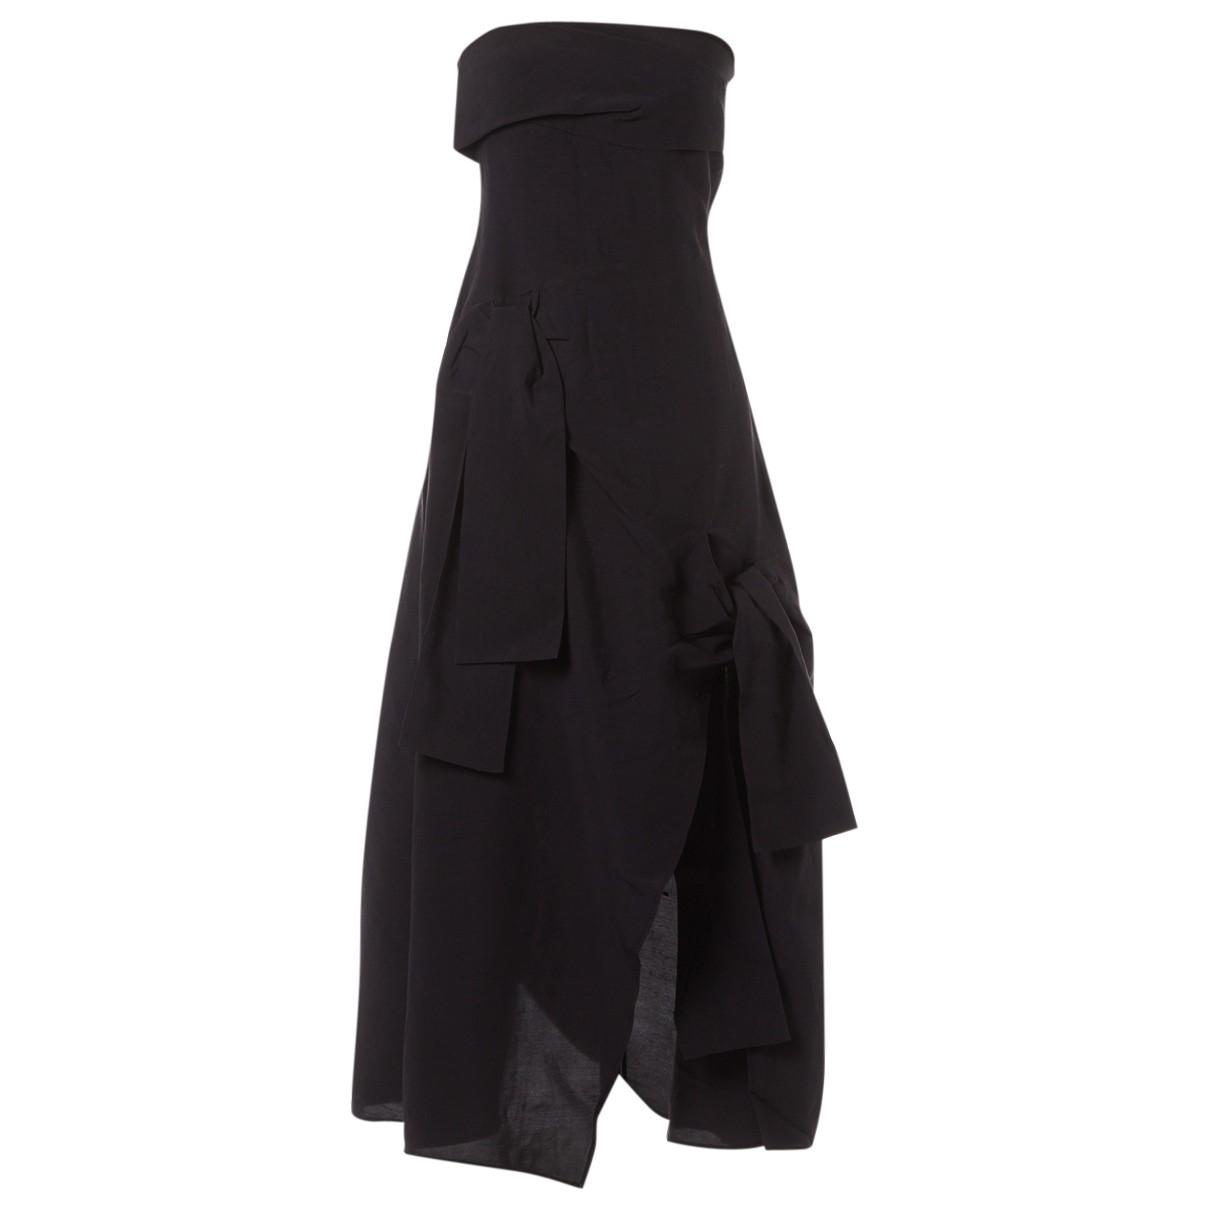 Rejina Pyo X Vestiaire Collective Maxi dress